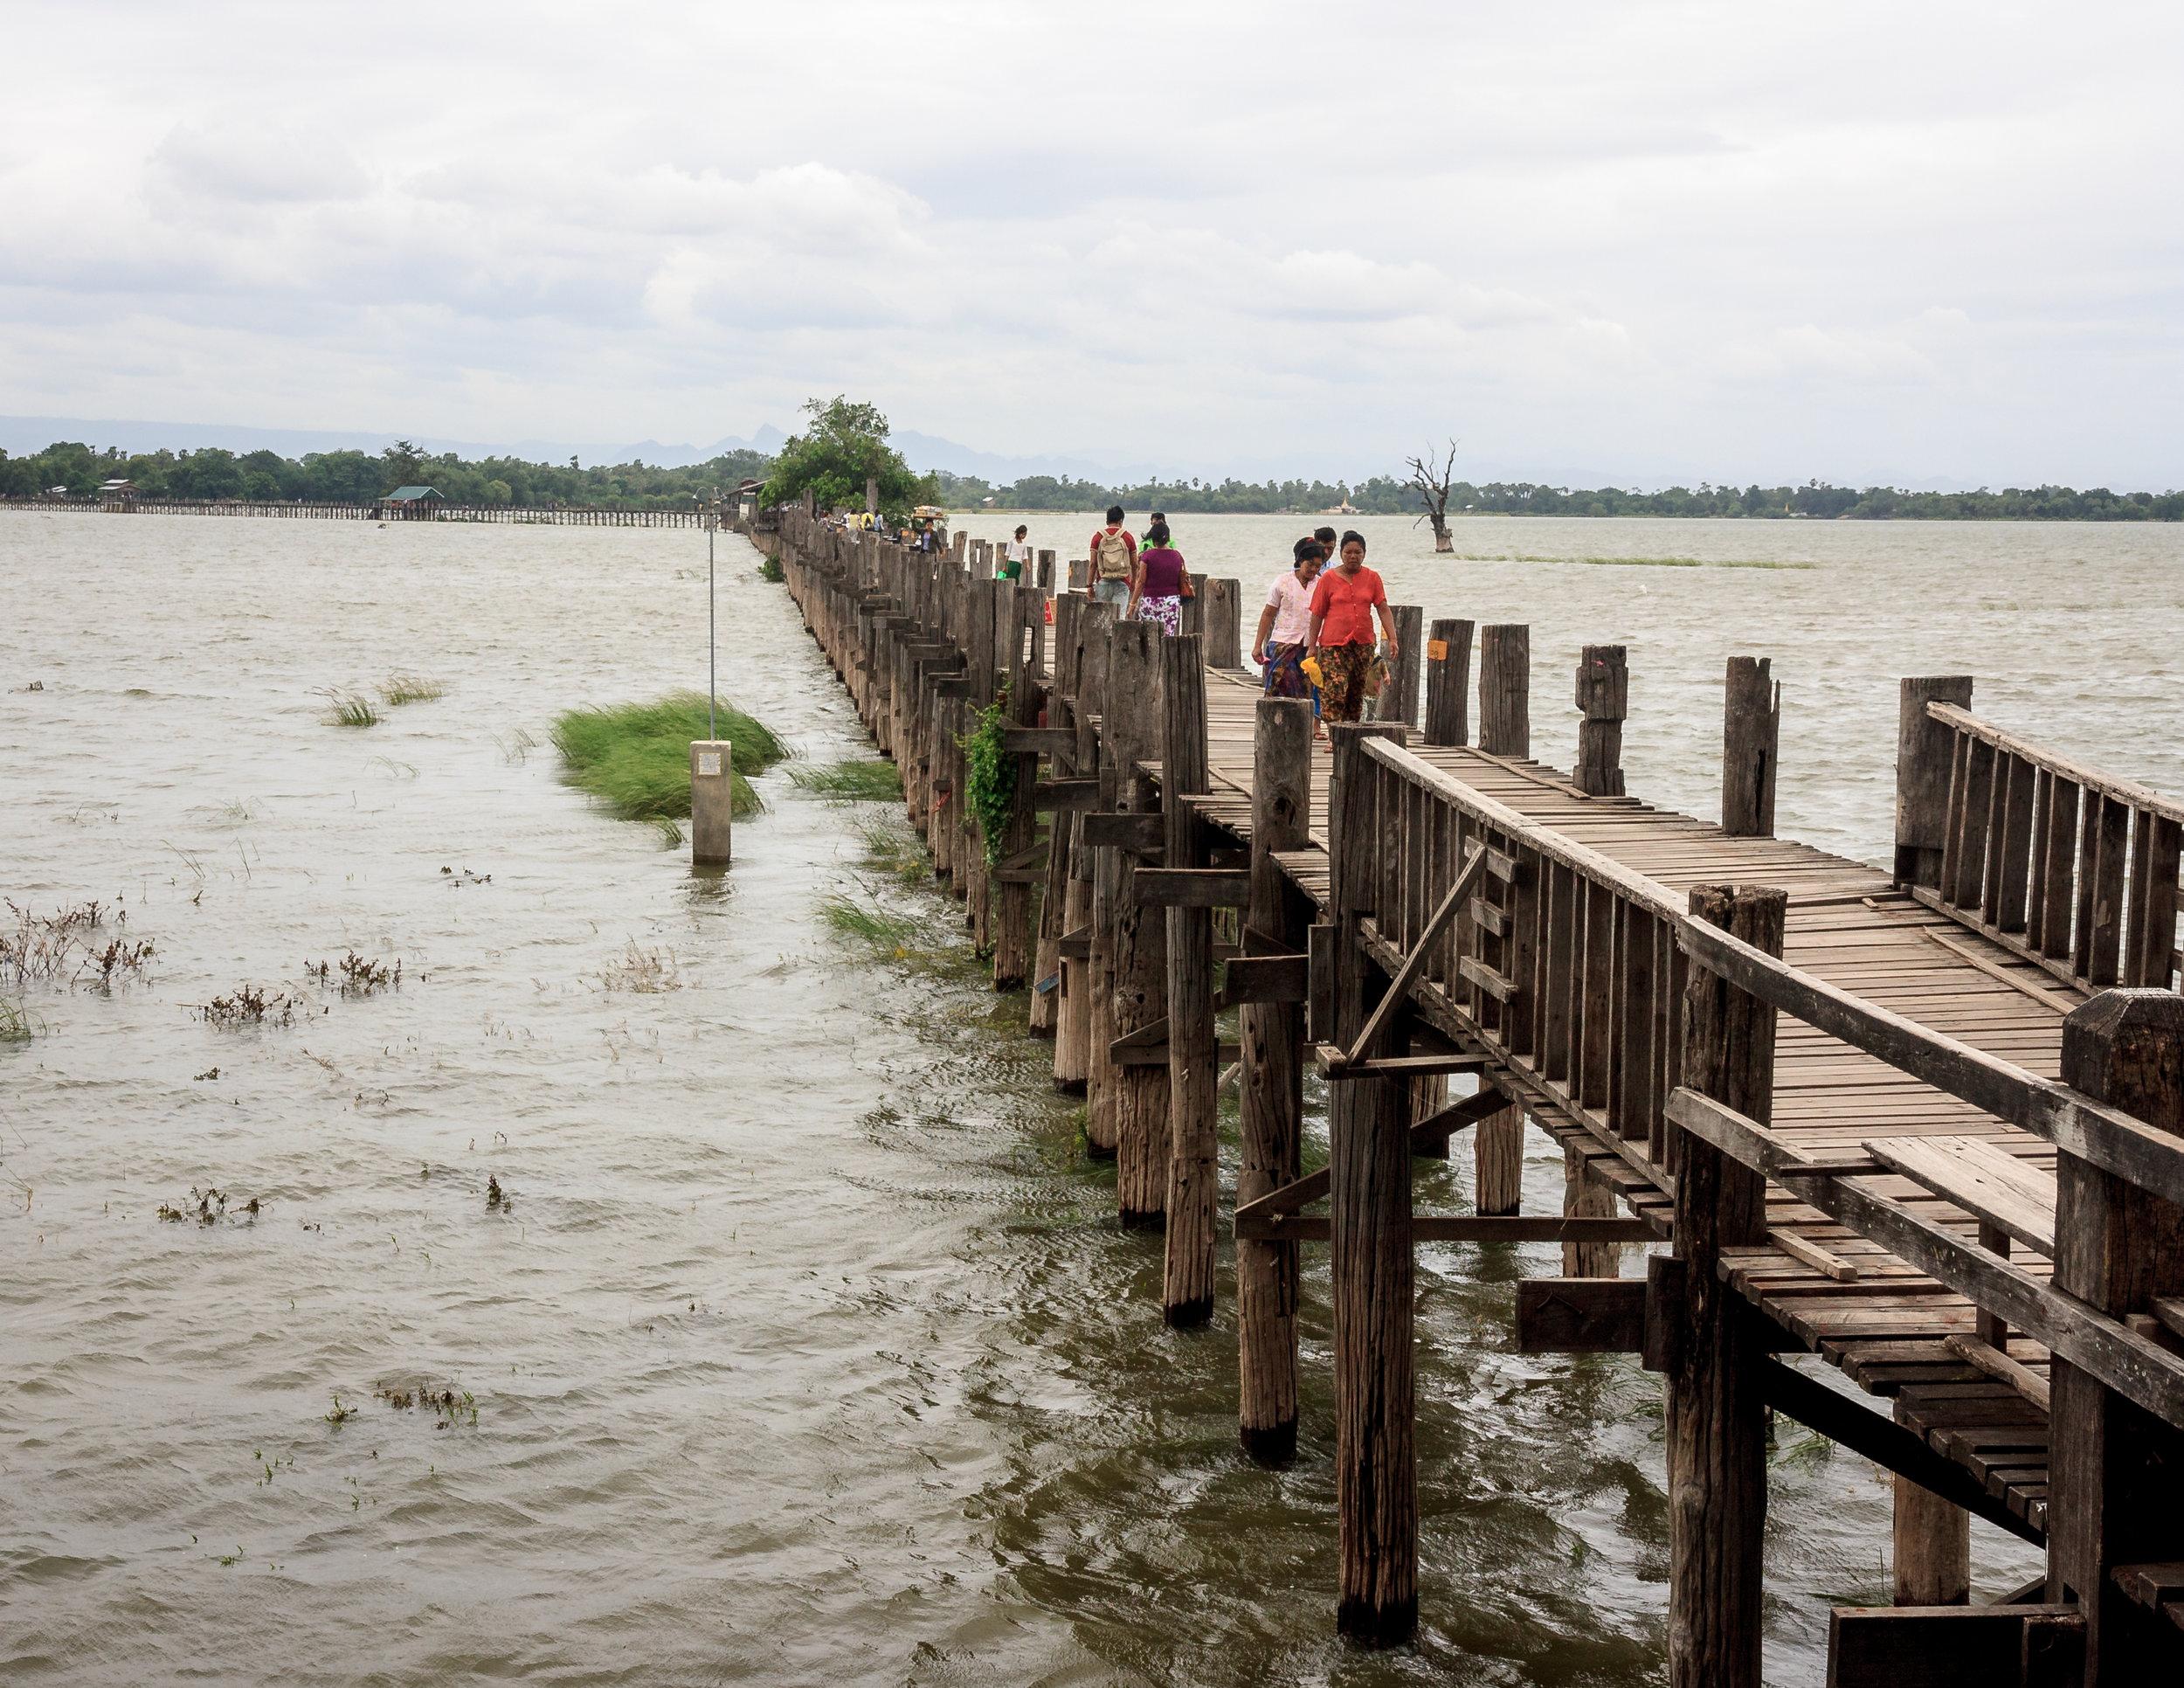 U-Bein Bridge, Manadalay in Myanmar (Burma)